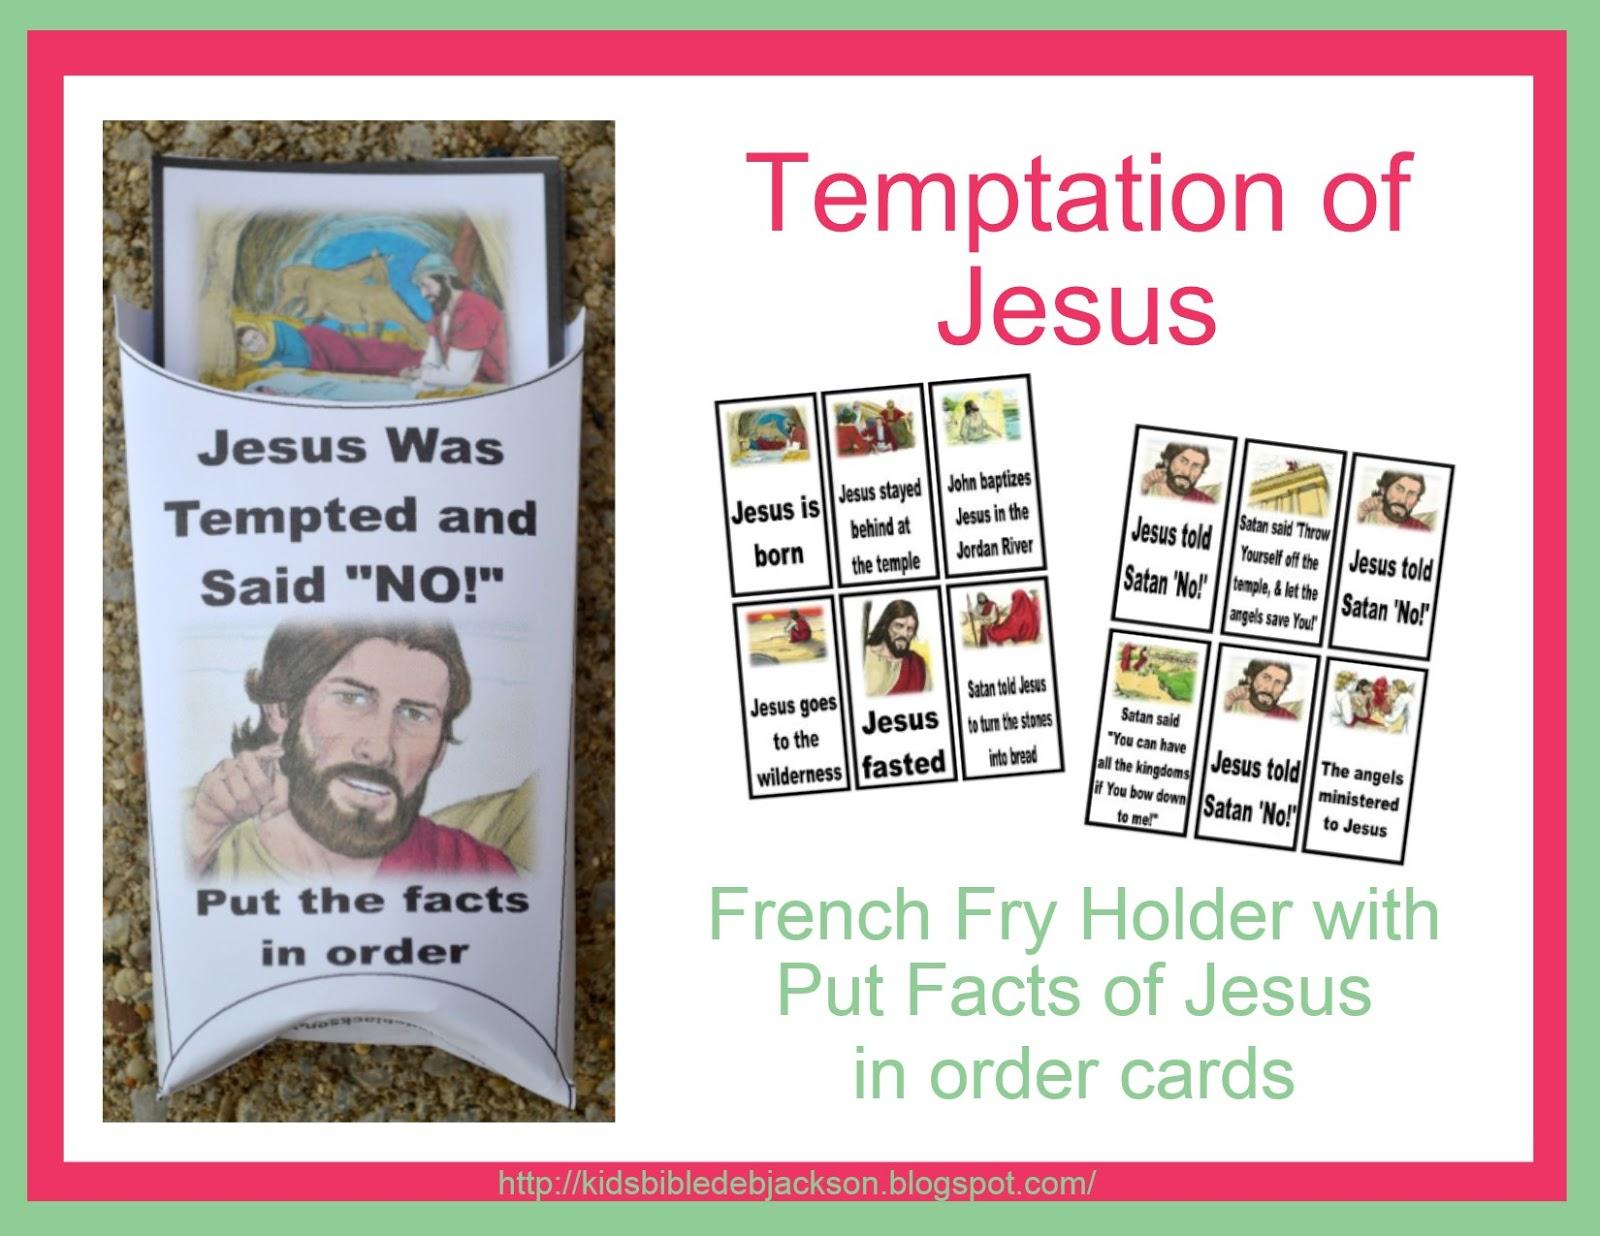 Bible Fun For Kids: Temptation of Jesus